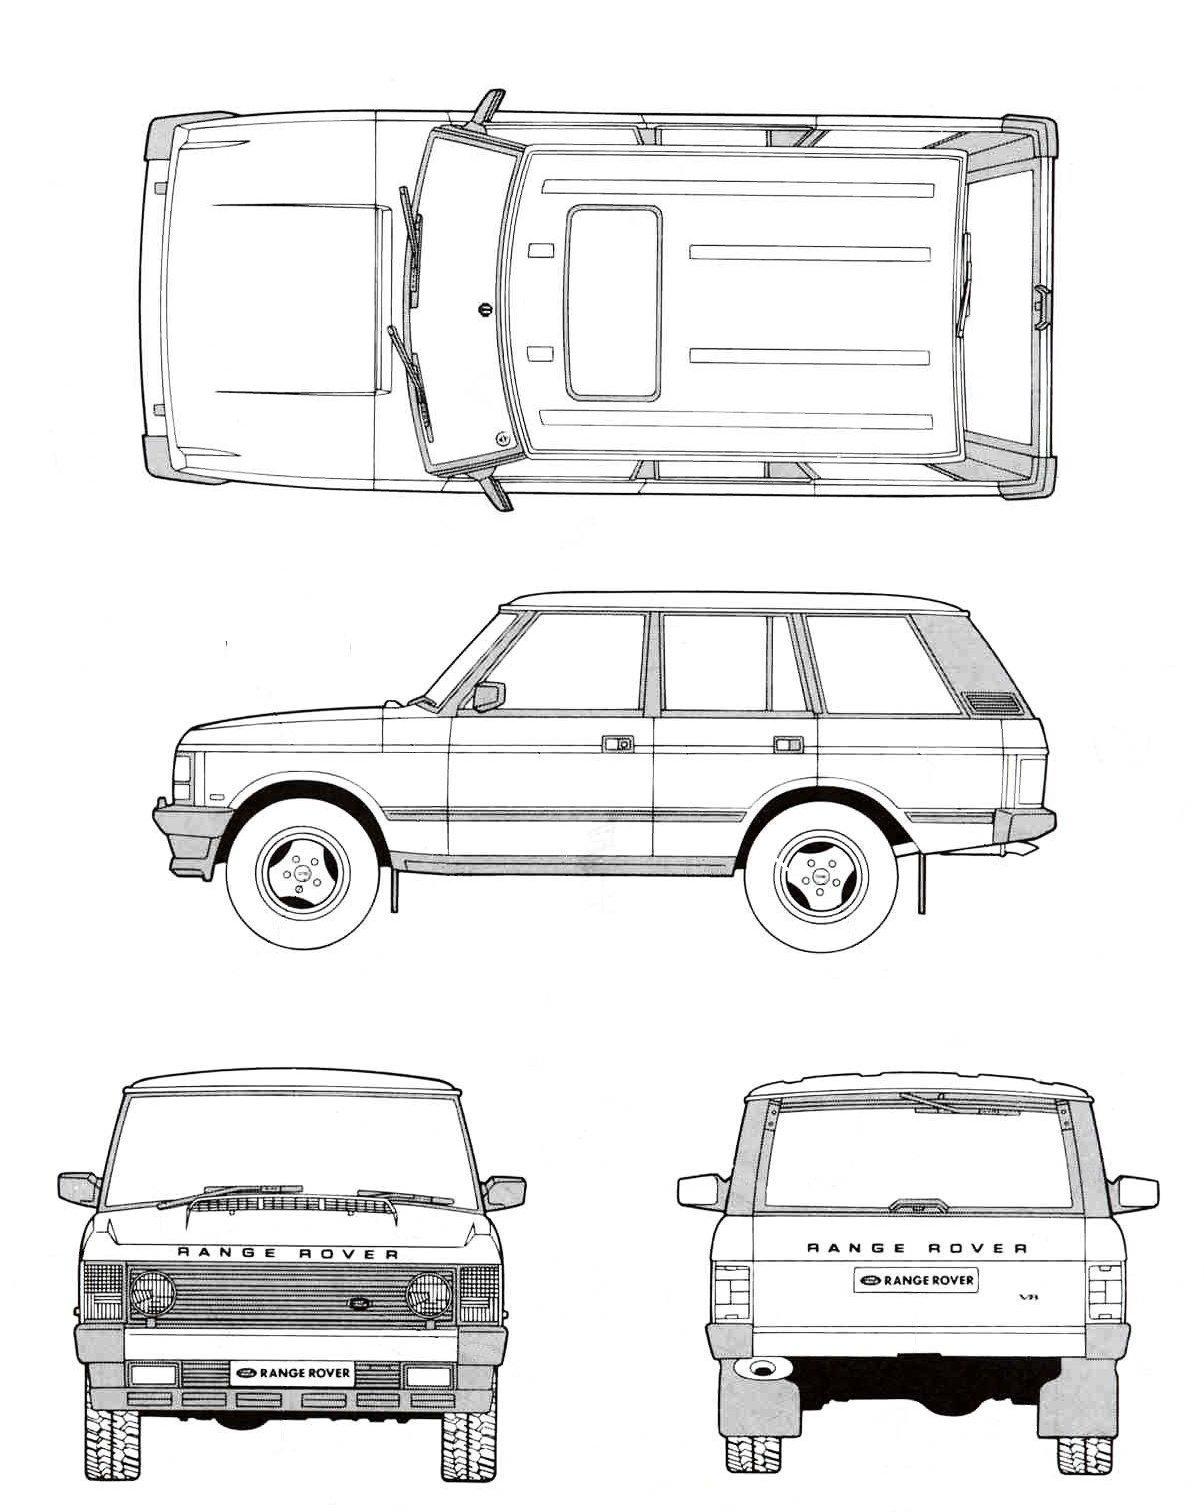 Land Rover Range Rover Blueprint